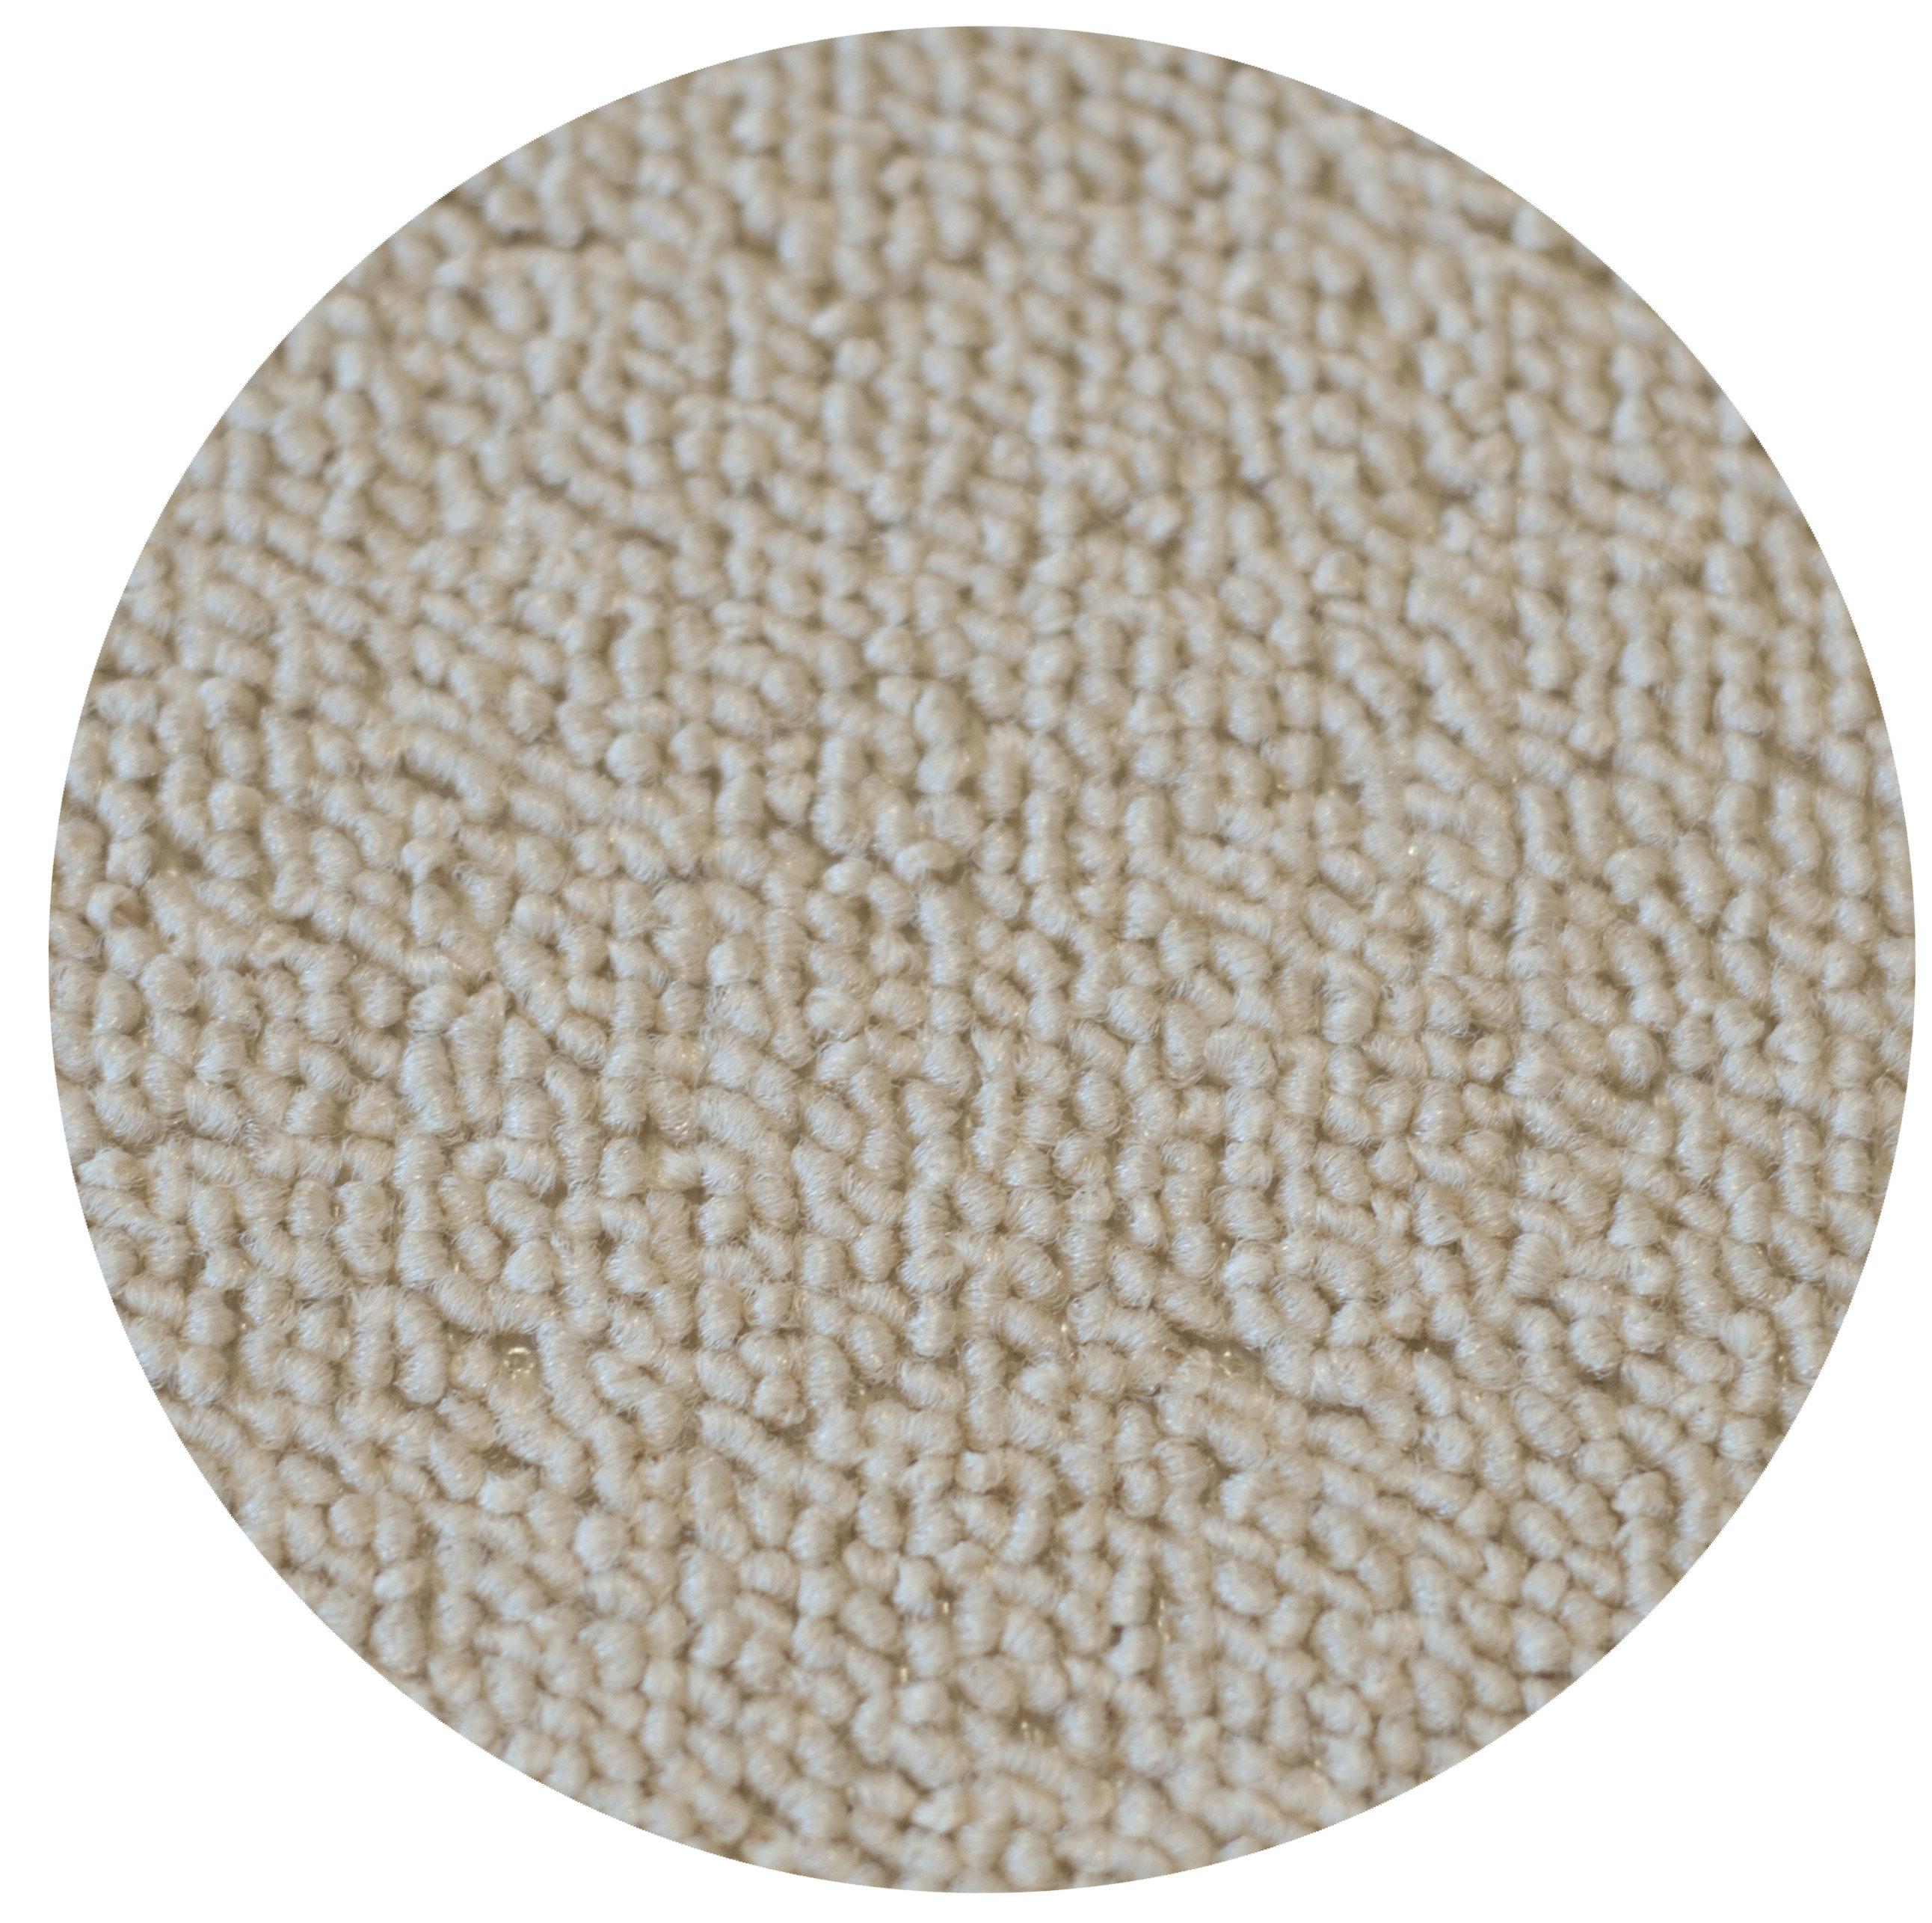 Textilgolv Heltäckningsmatta Fibertrone Basic 14m² Beige 66